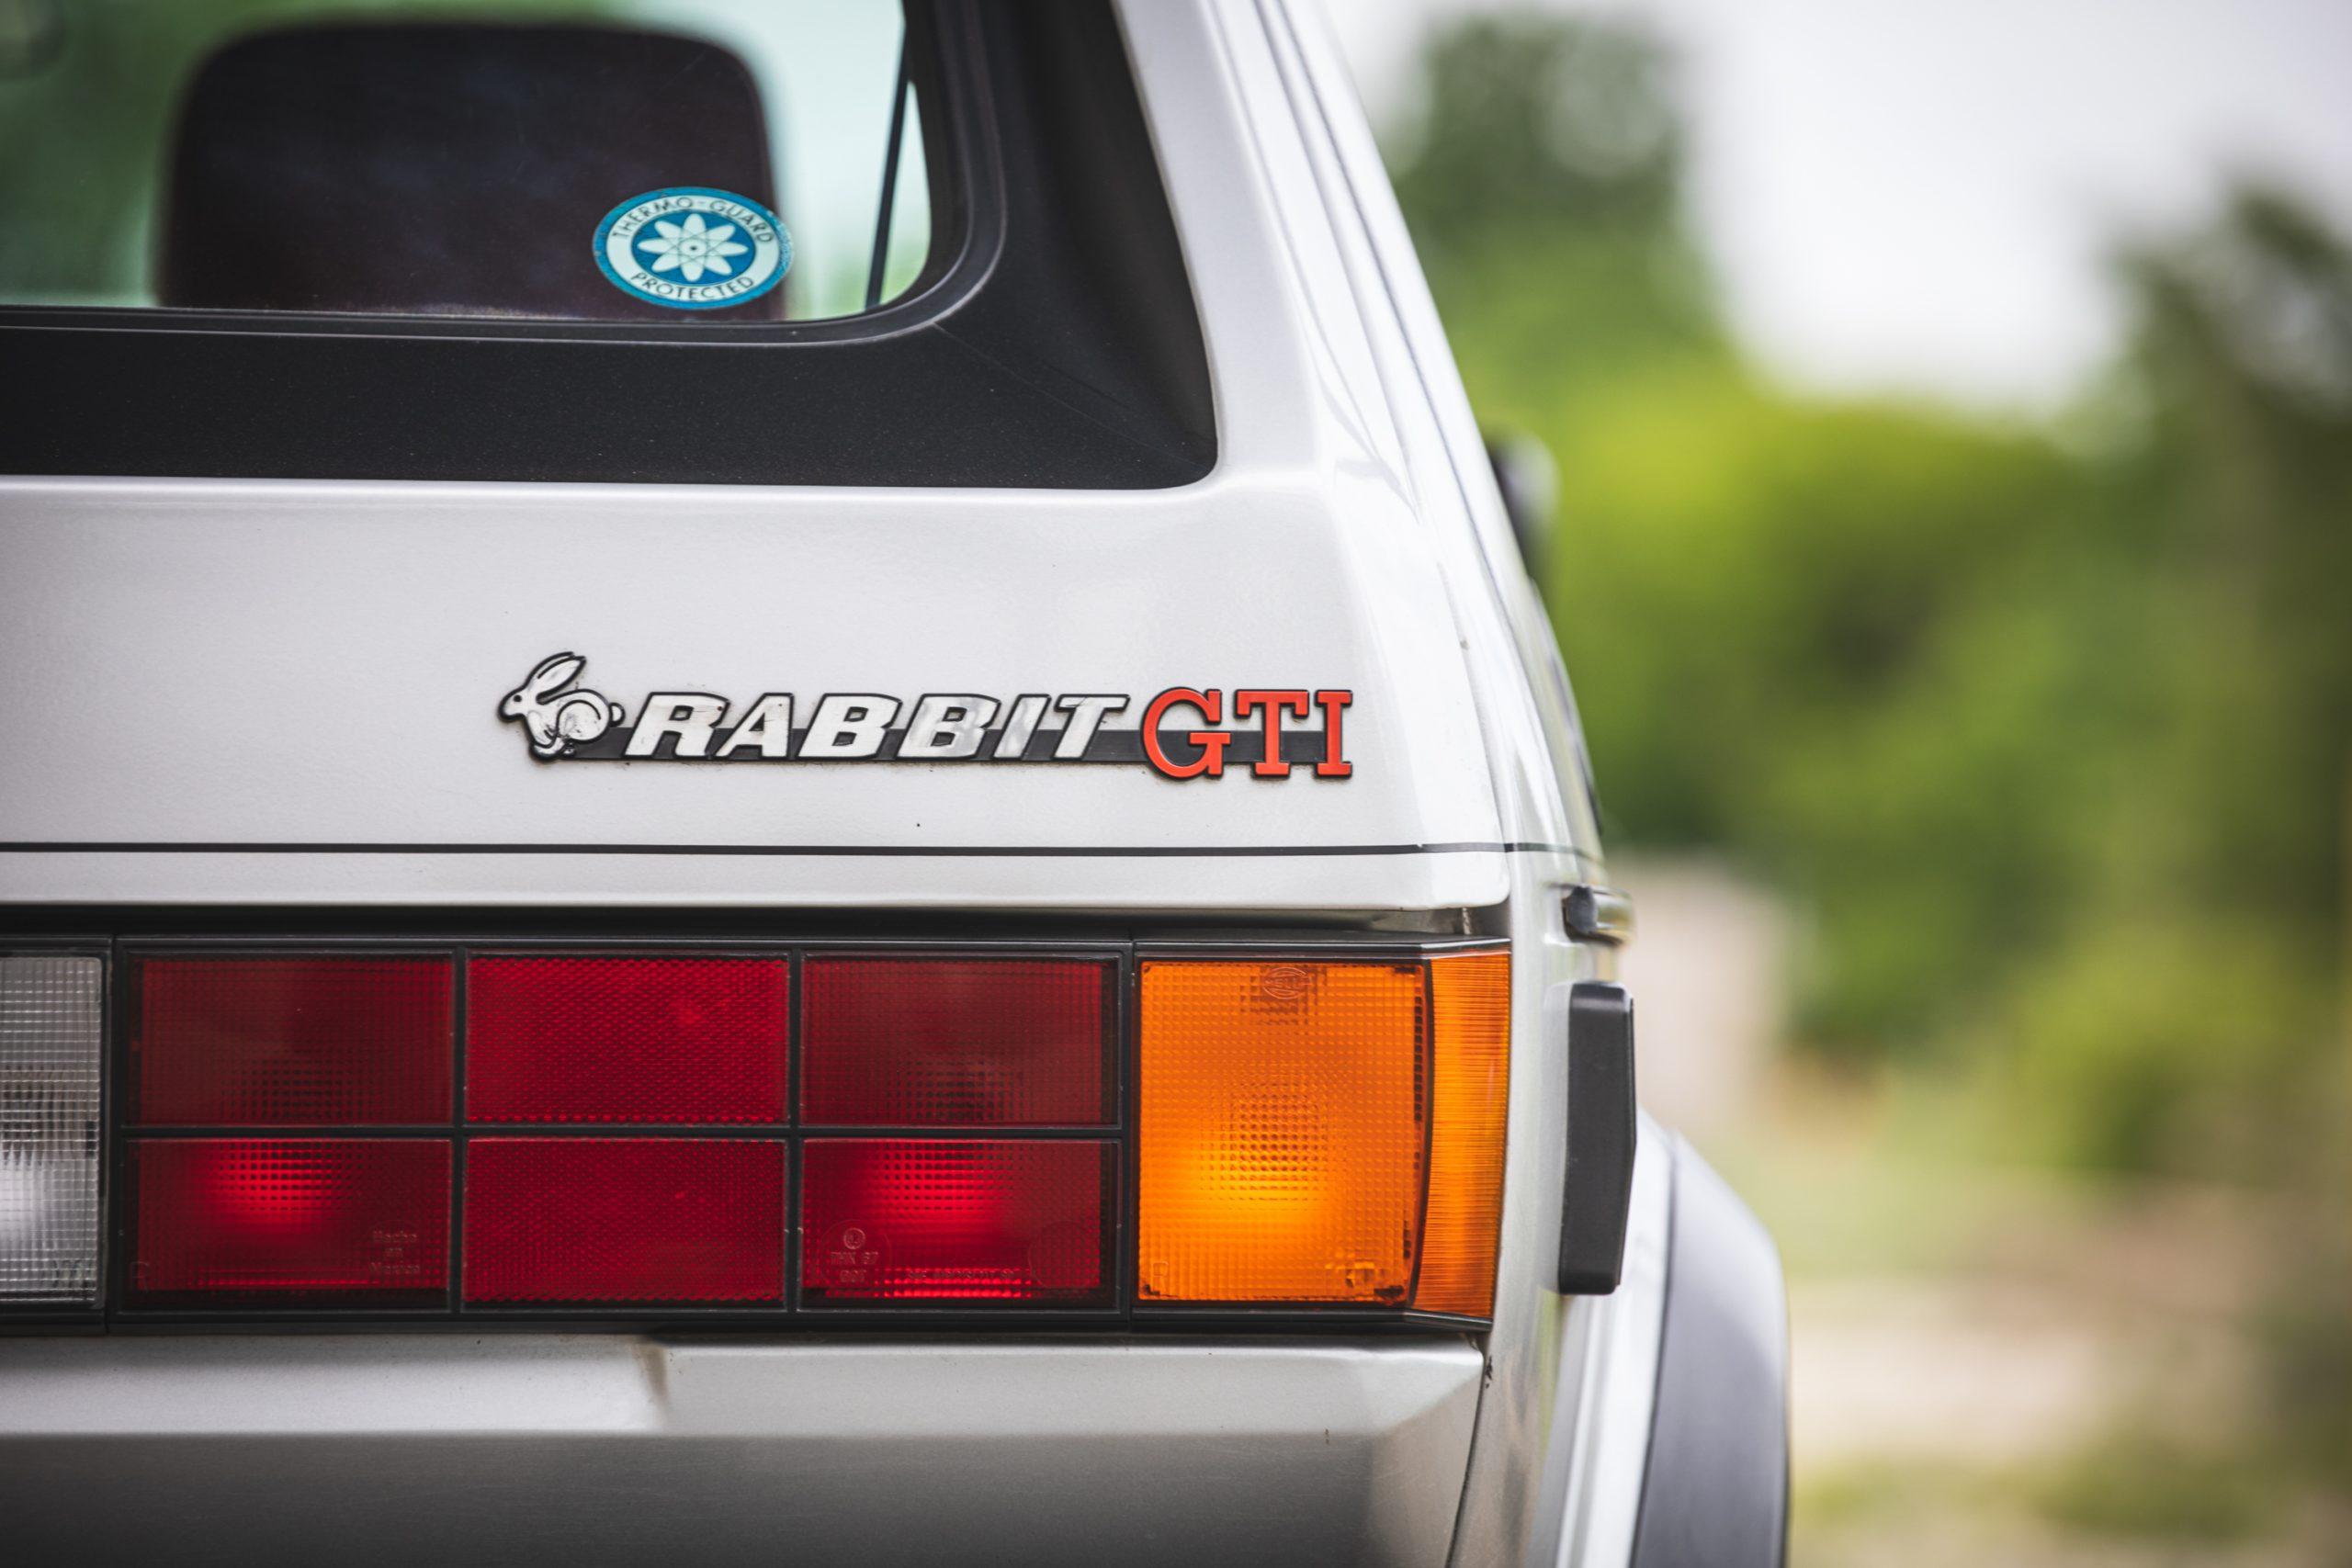 retro volkswagen rabbit gti hatchback rear badging